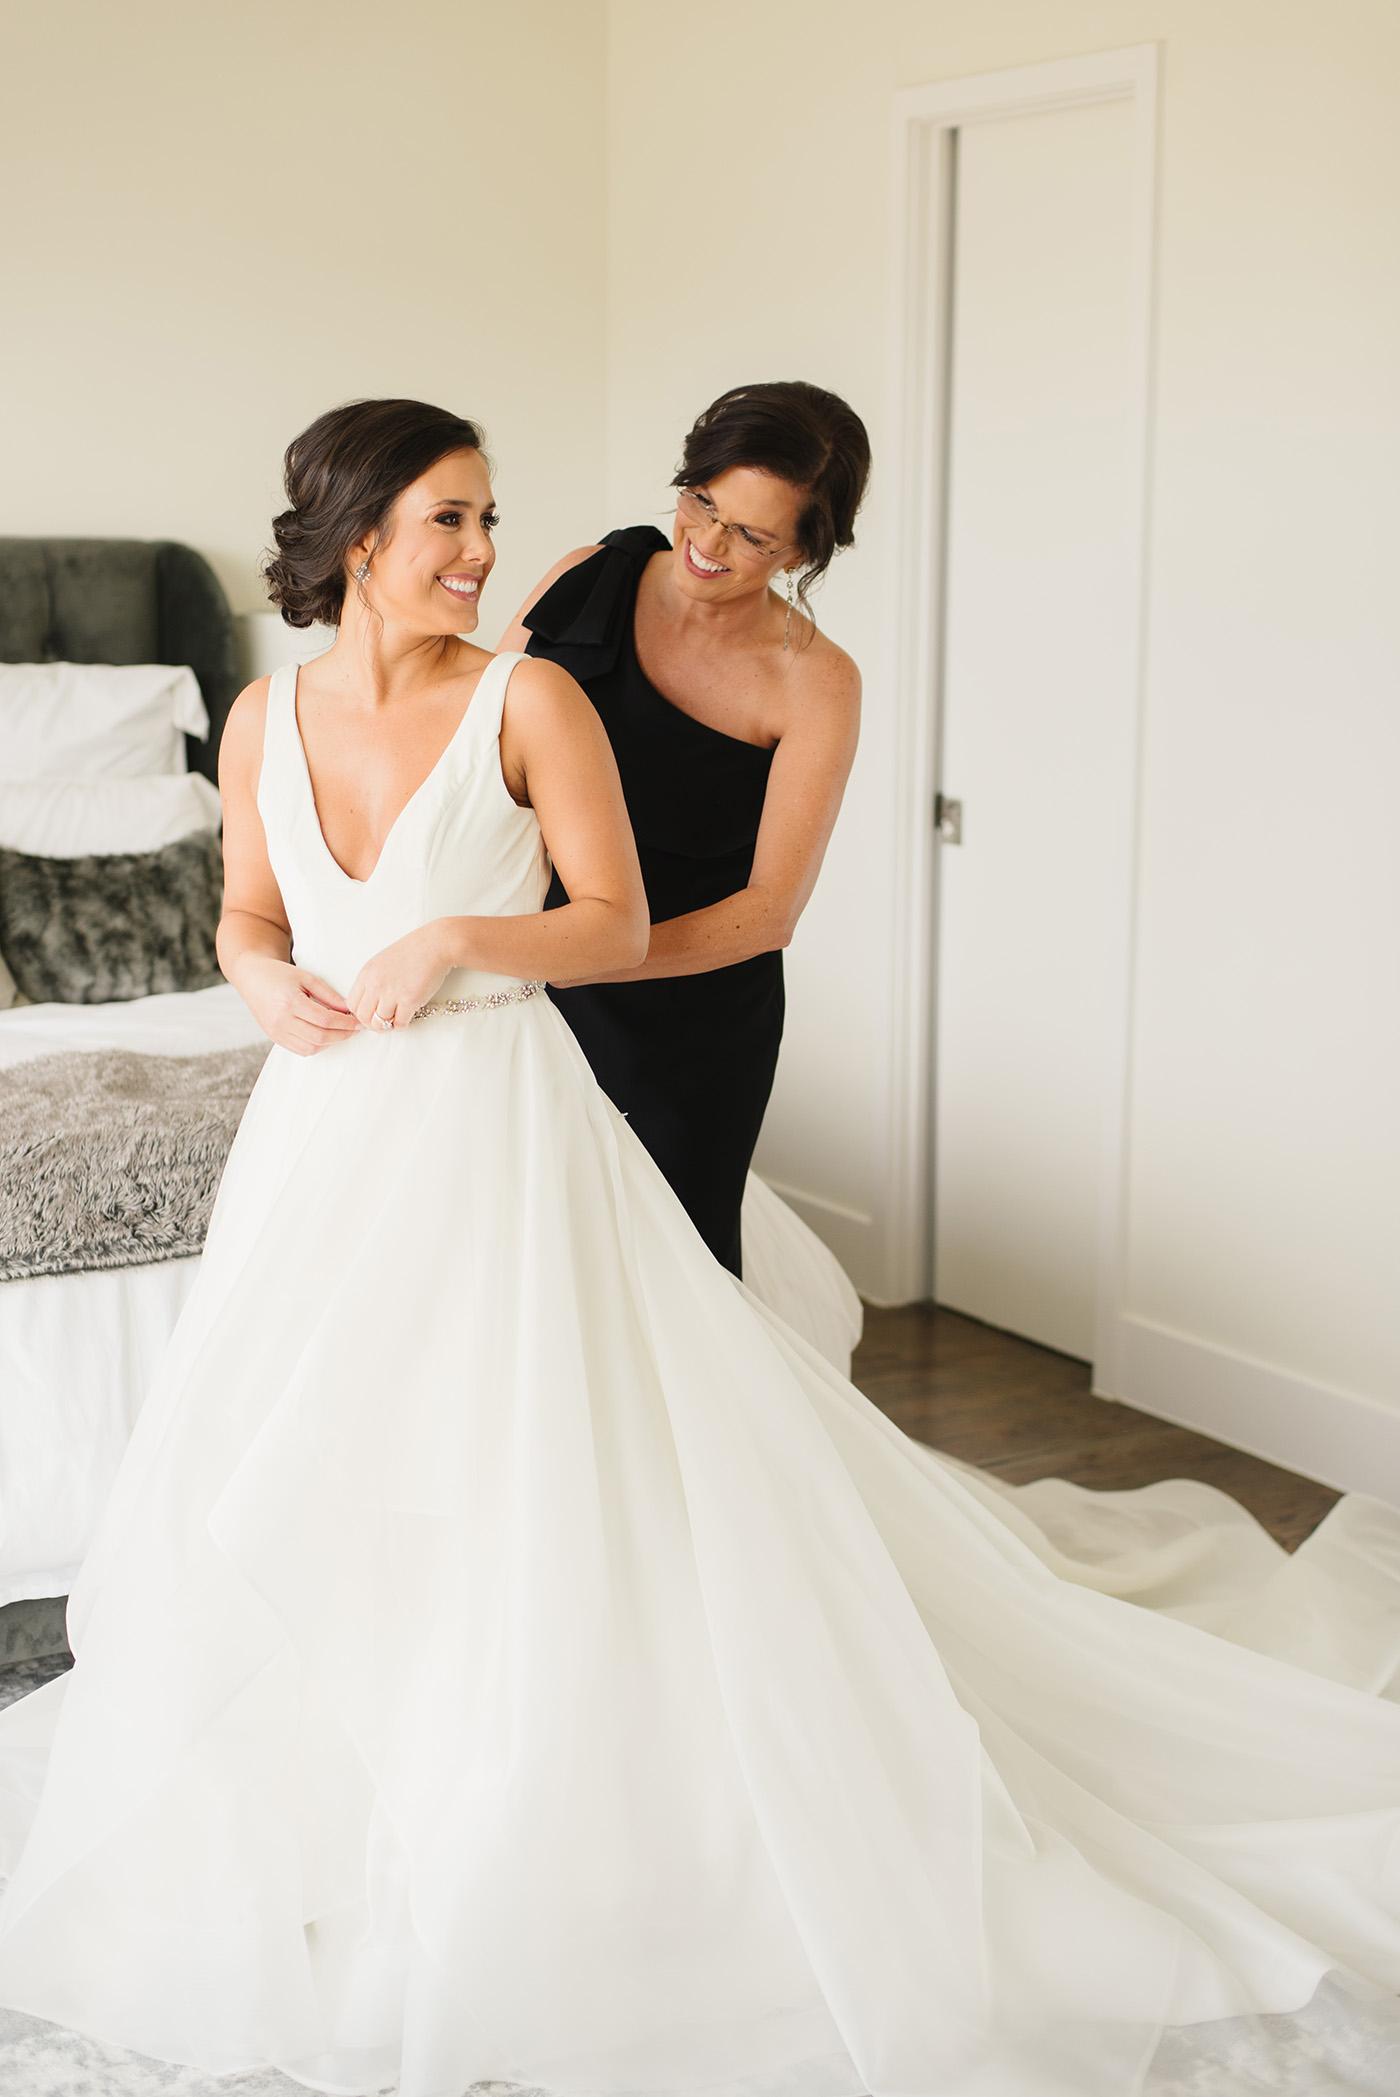 Dallas Wedding Planner - Winter Wedding at The Room on Main - Allday Events - 42.jpg